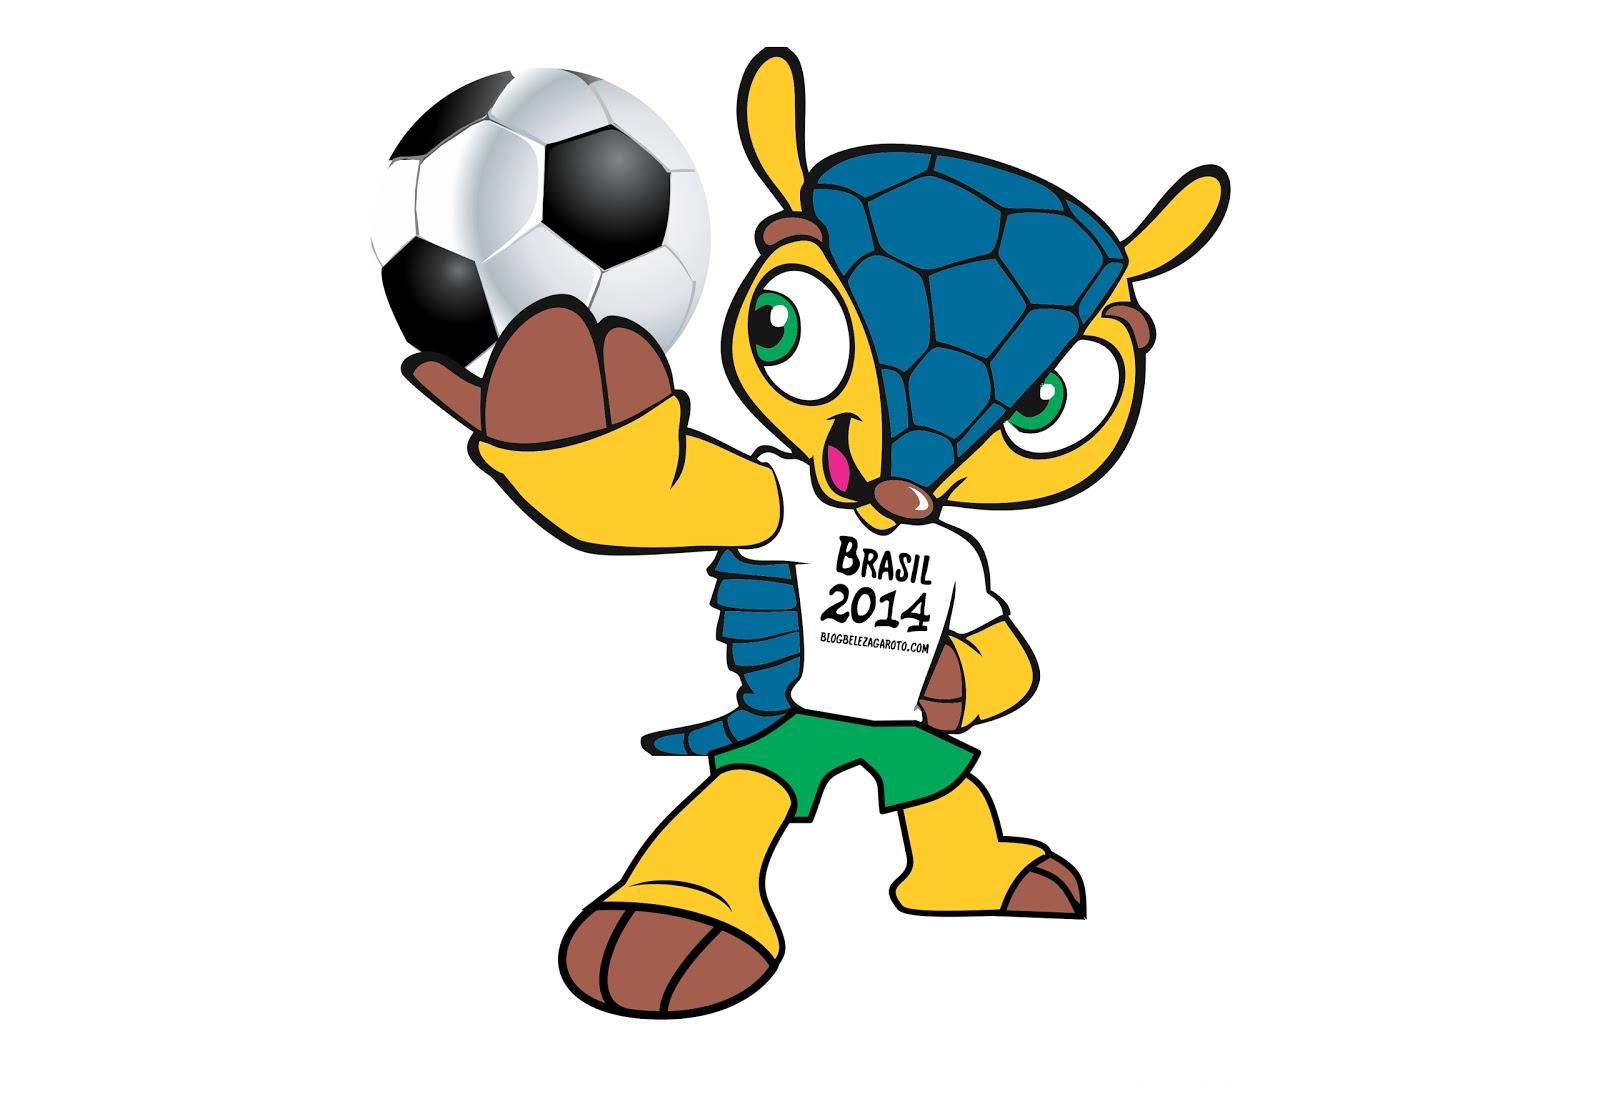 Bola oficial  A bola oficial da Copa do Mundo de 2014 chama-se Brazuca ce4e6d10eb5